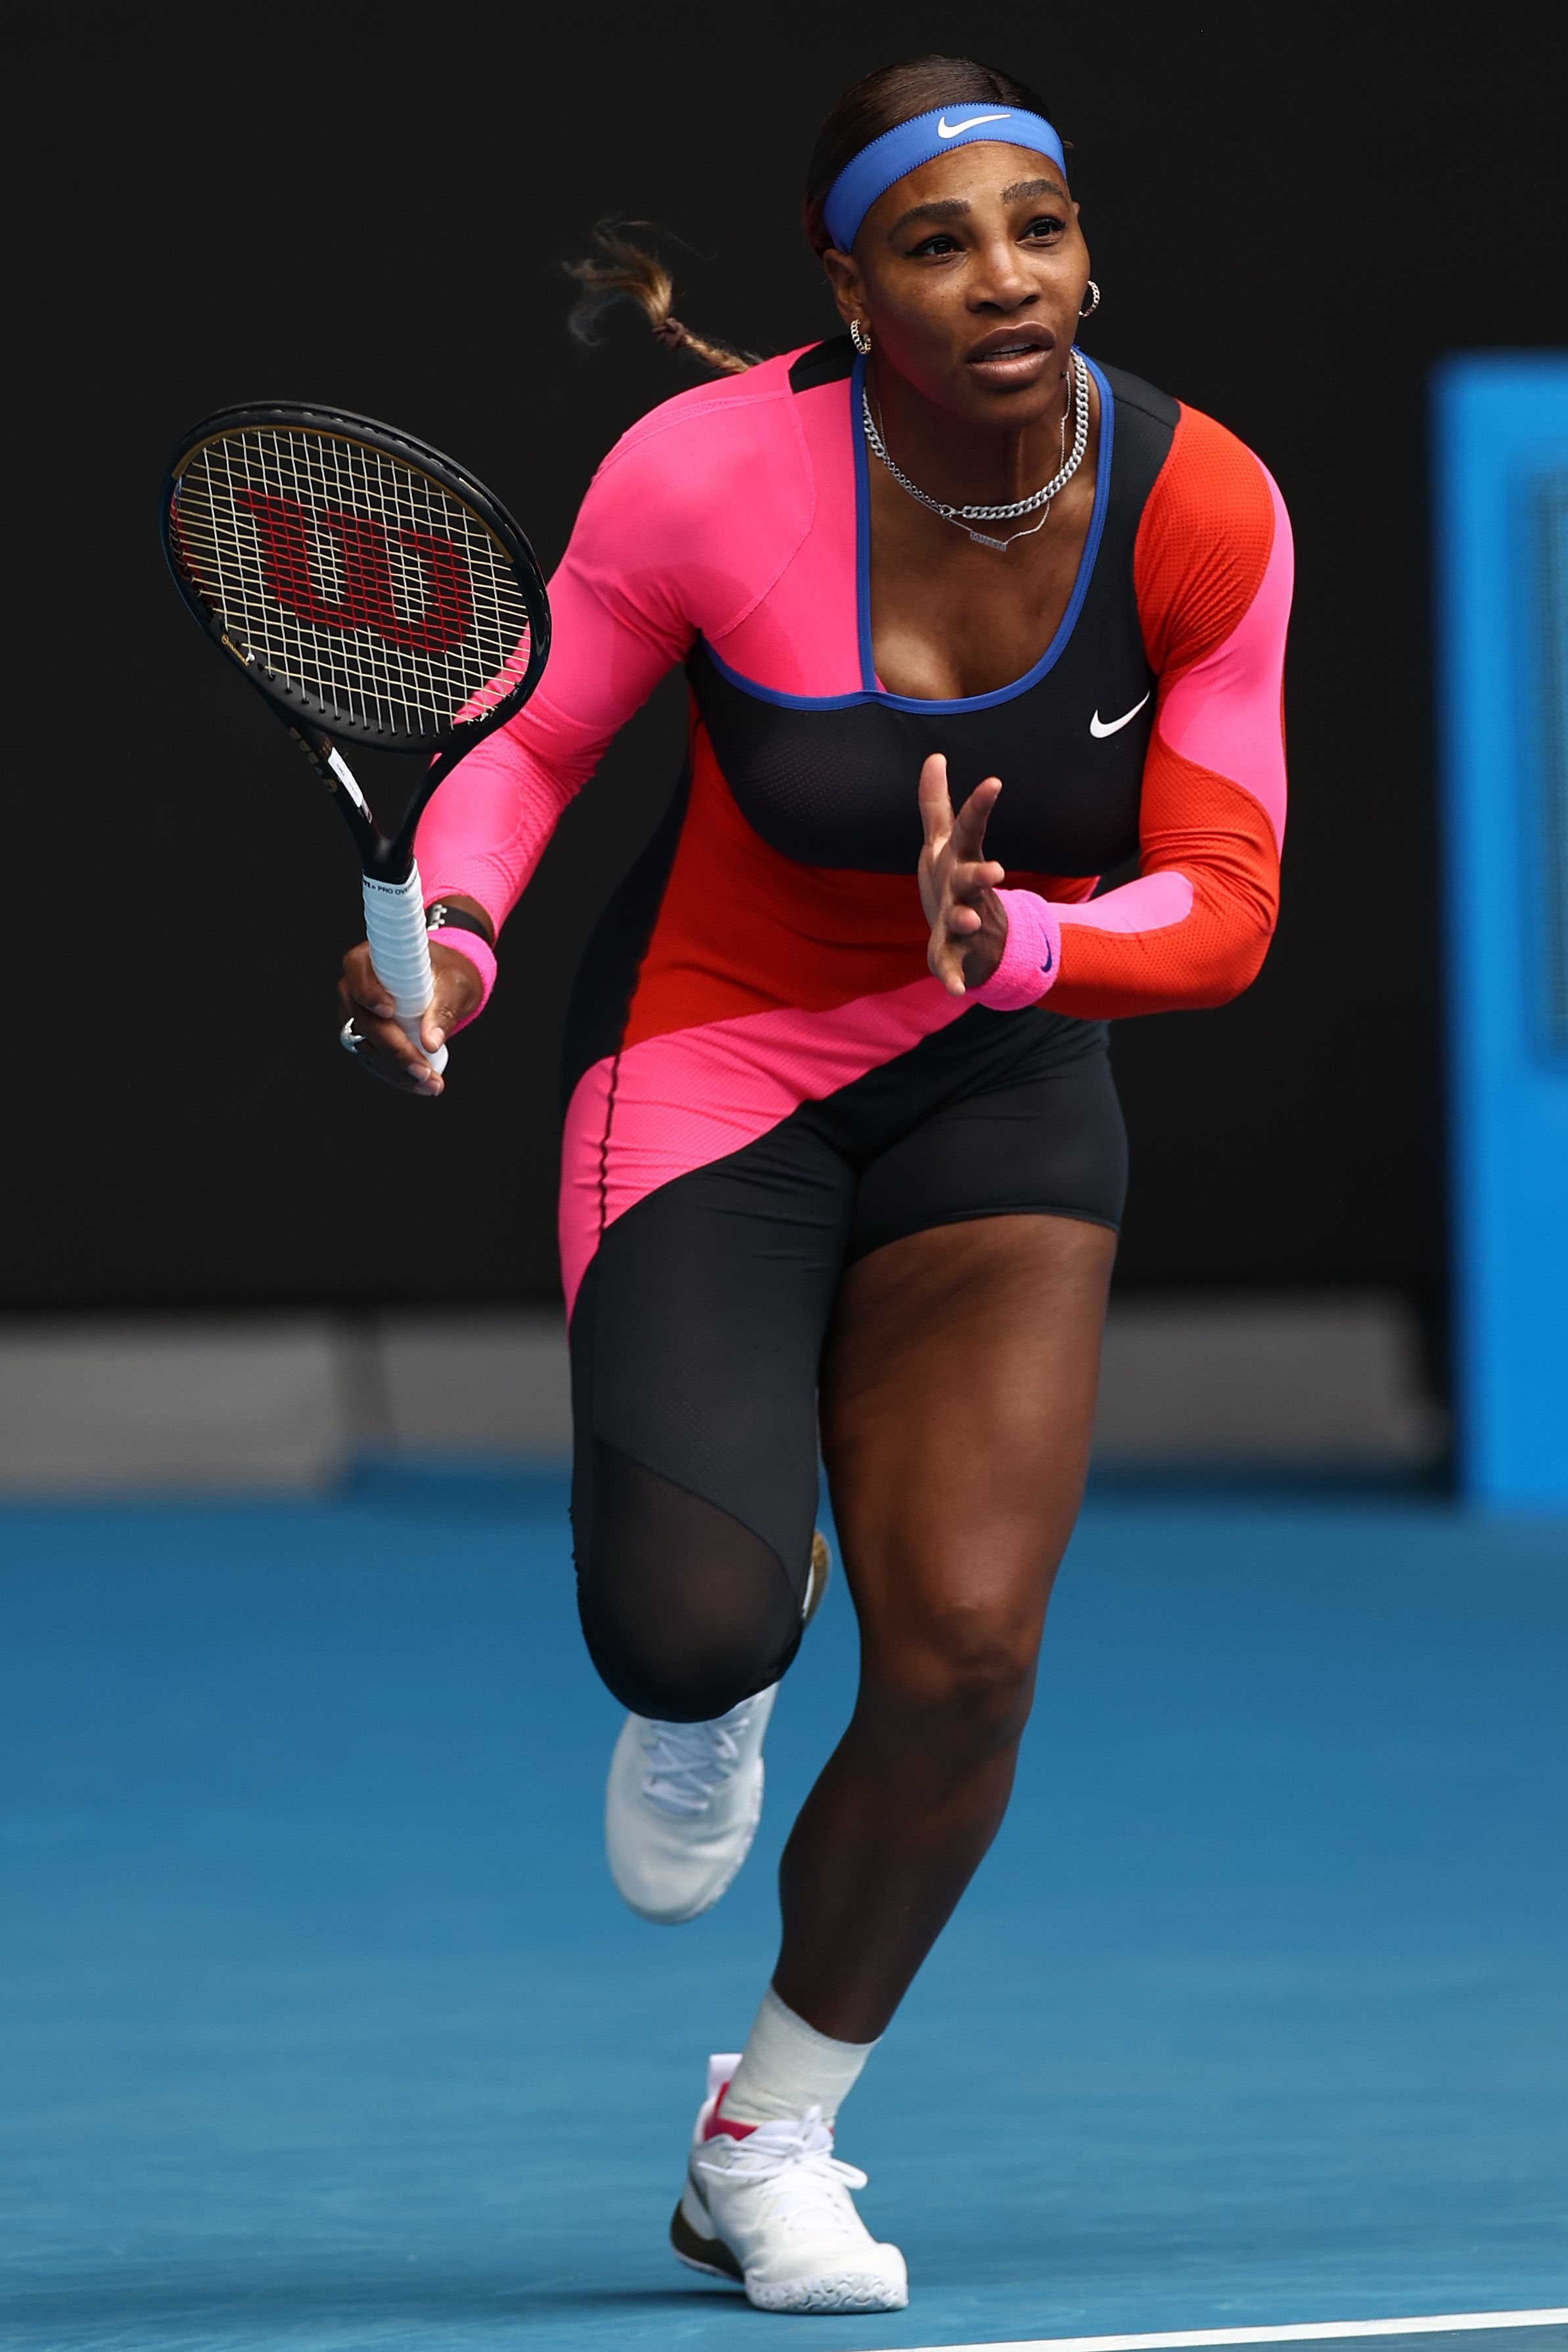 Serena Williams Pays Tribute to Sports Champion Flo-Jo in an Asymmetric Tennis Unitard